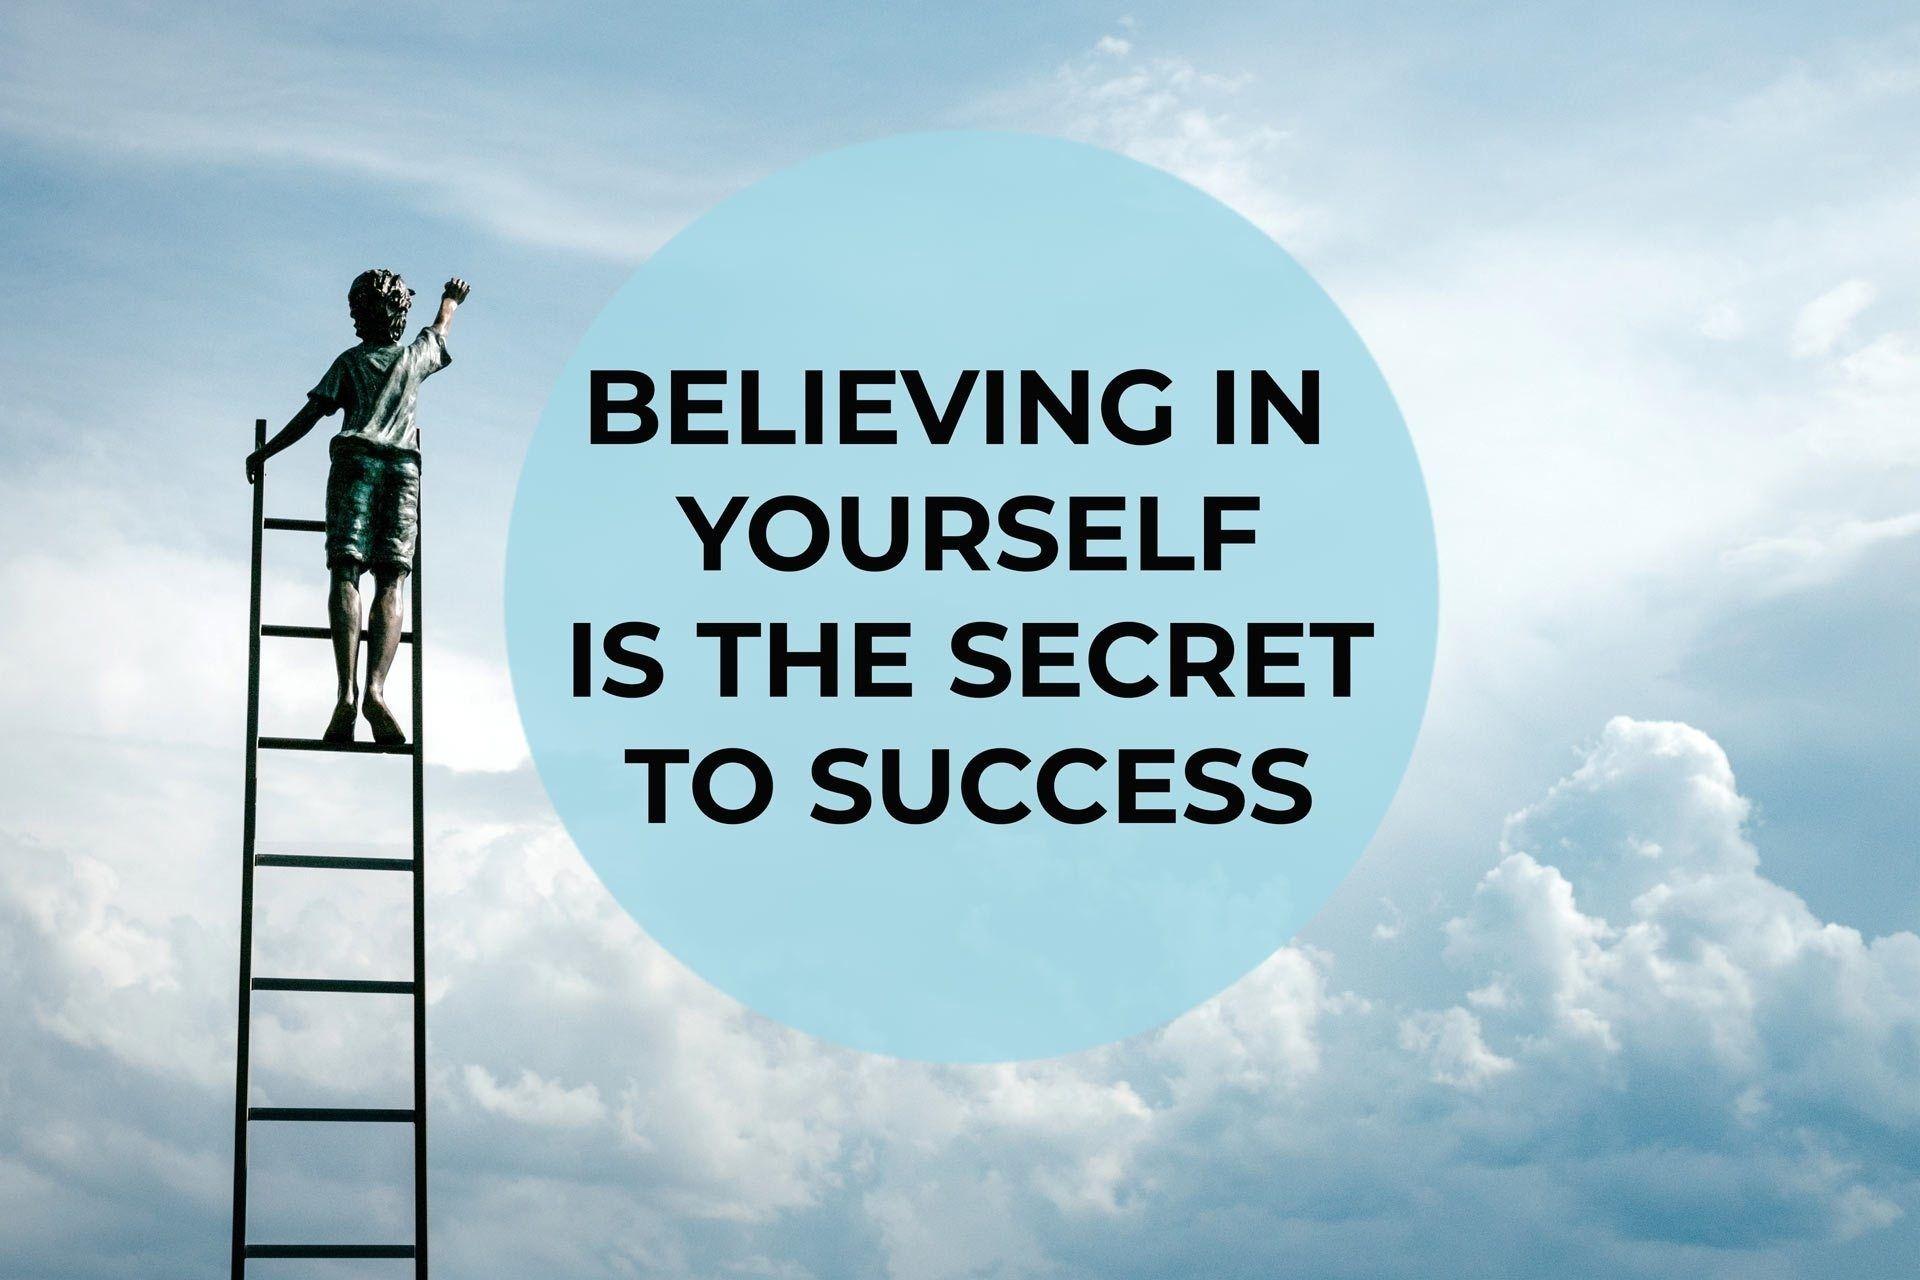 Http Readr Me Mjk1f Secret To Success Success Quotes And Sayings Success